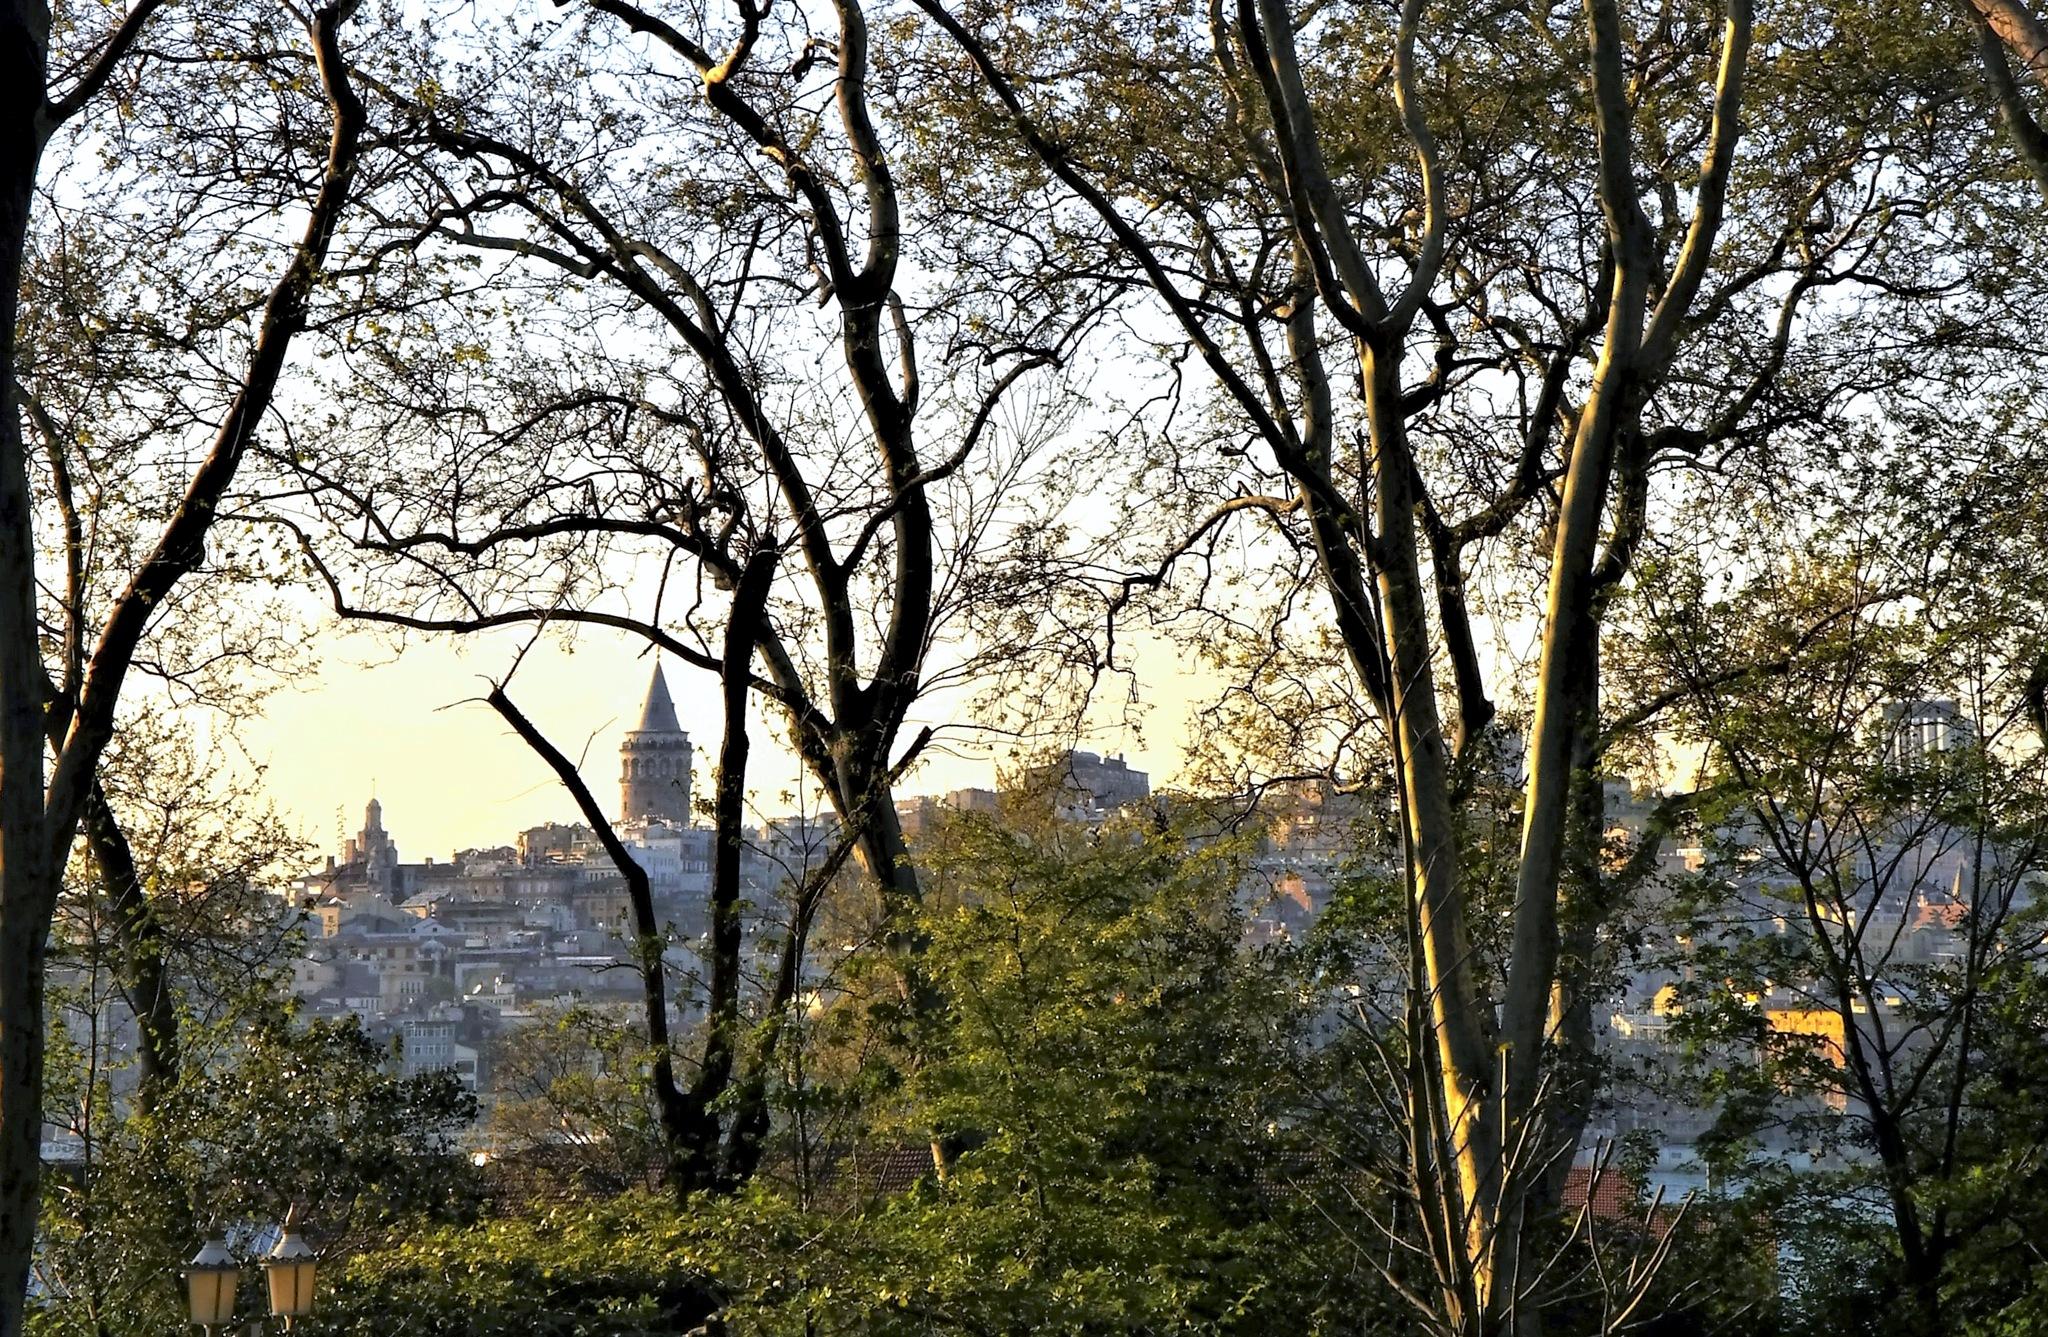 galata tower through the trees by Muhsin Özcan